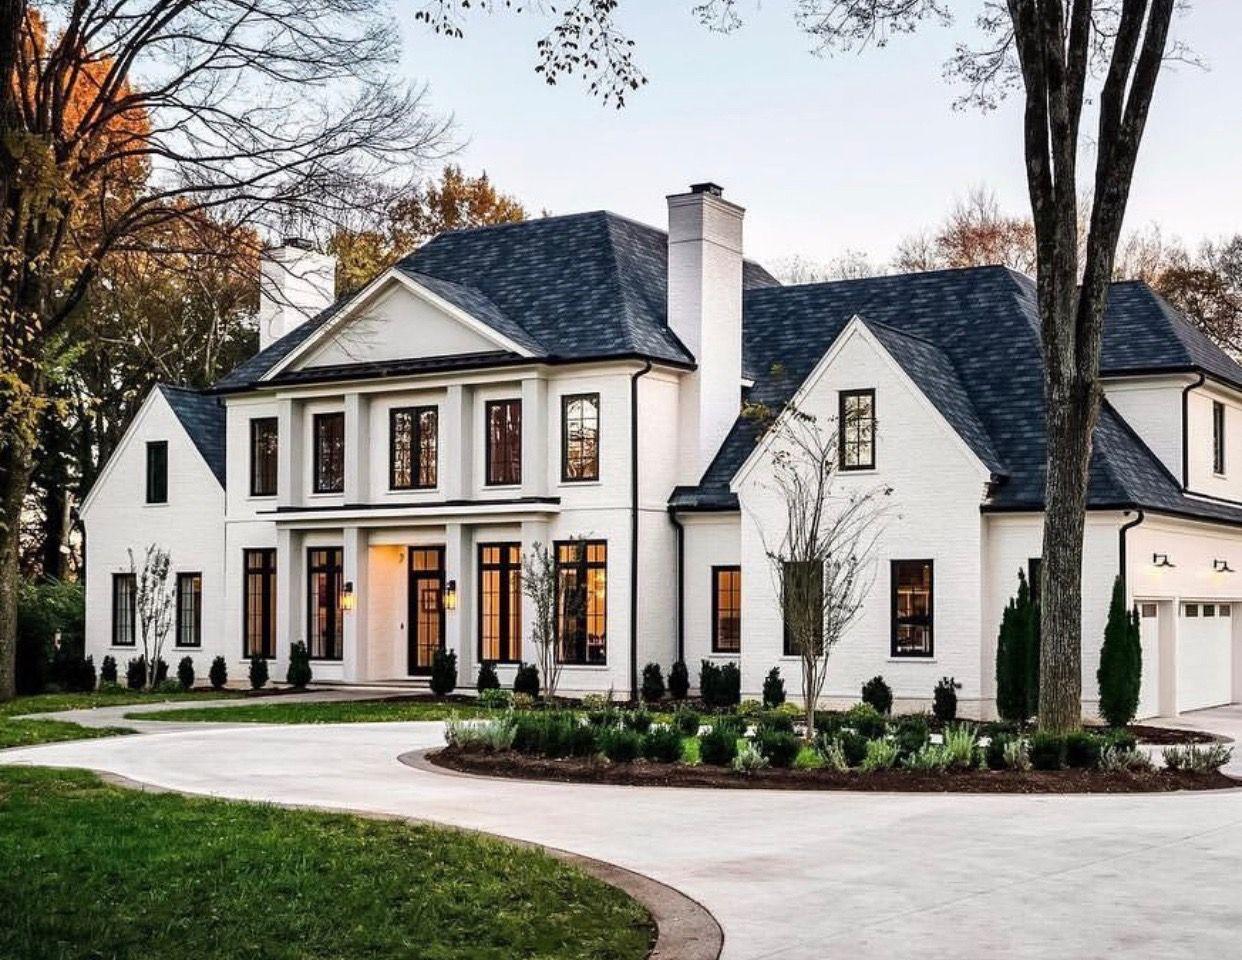 Nashville Tn Dream House Exterior House Exterior Luxury Homes Dream Houses